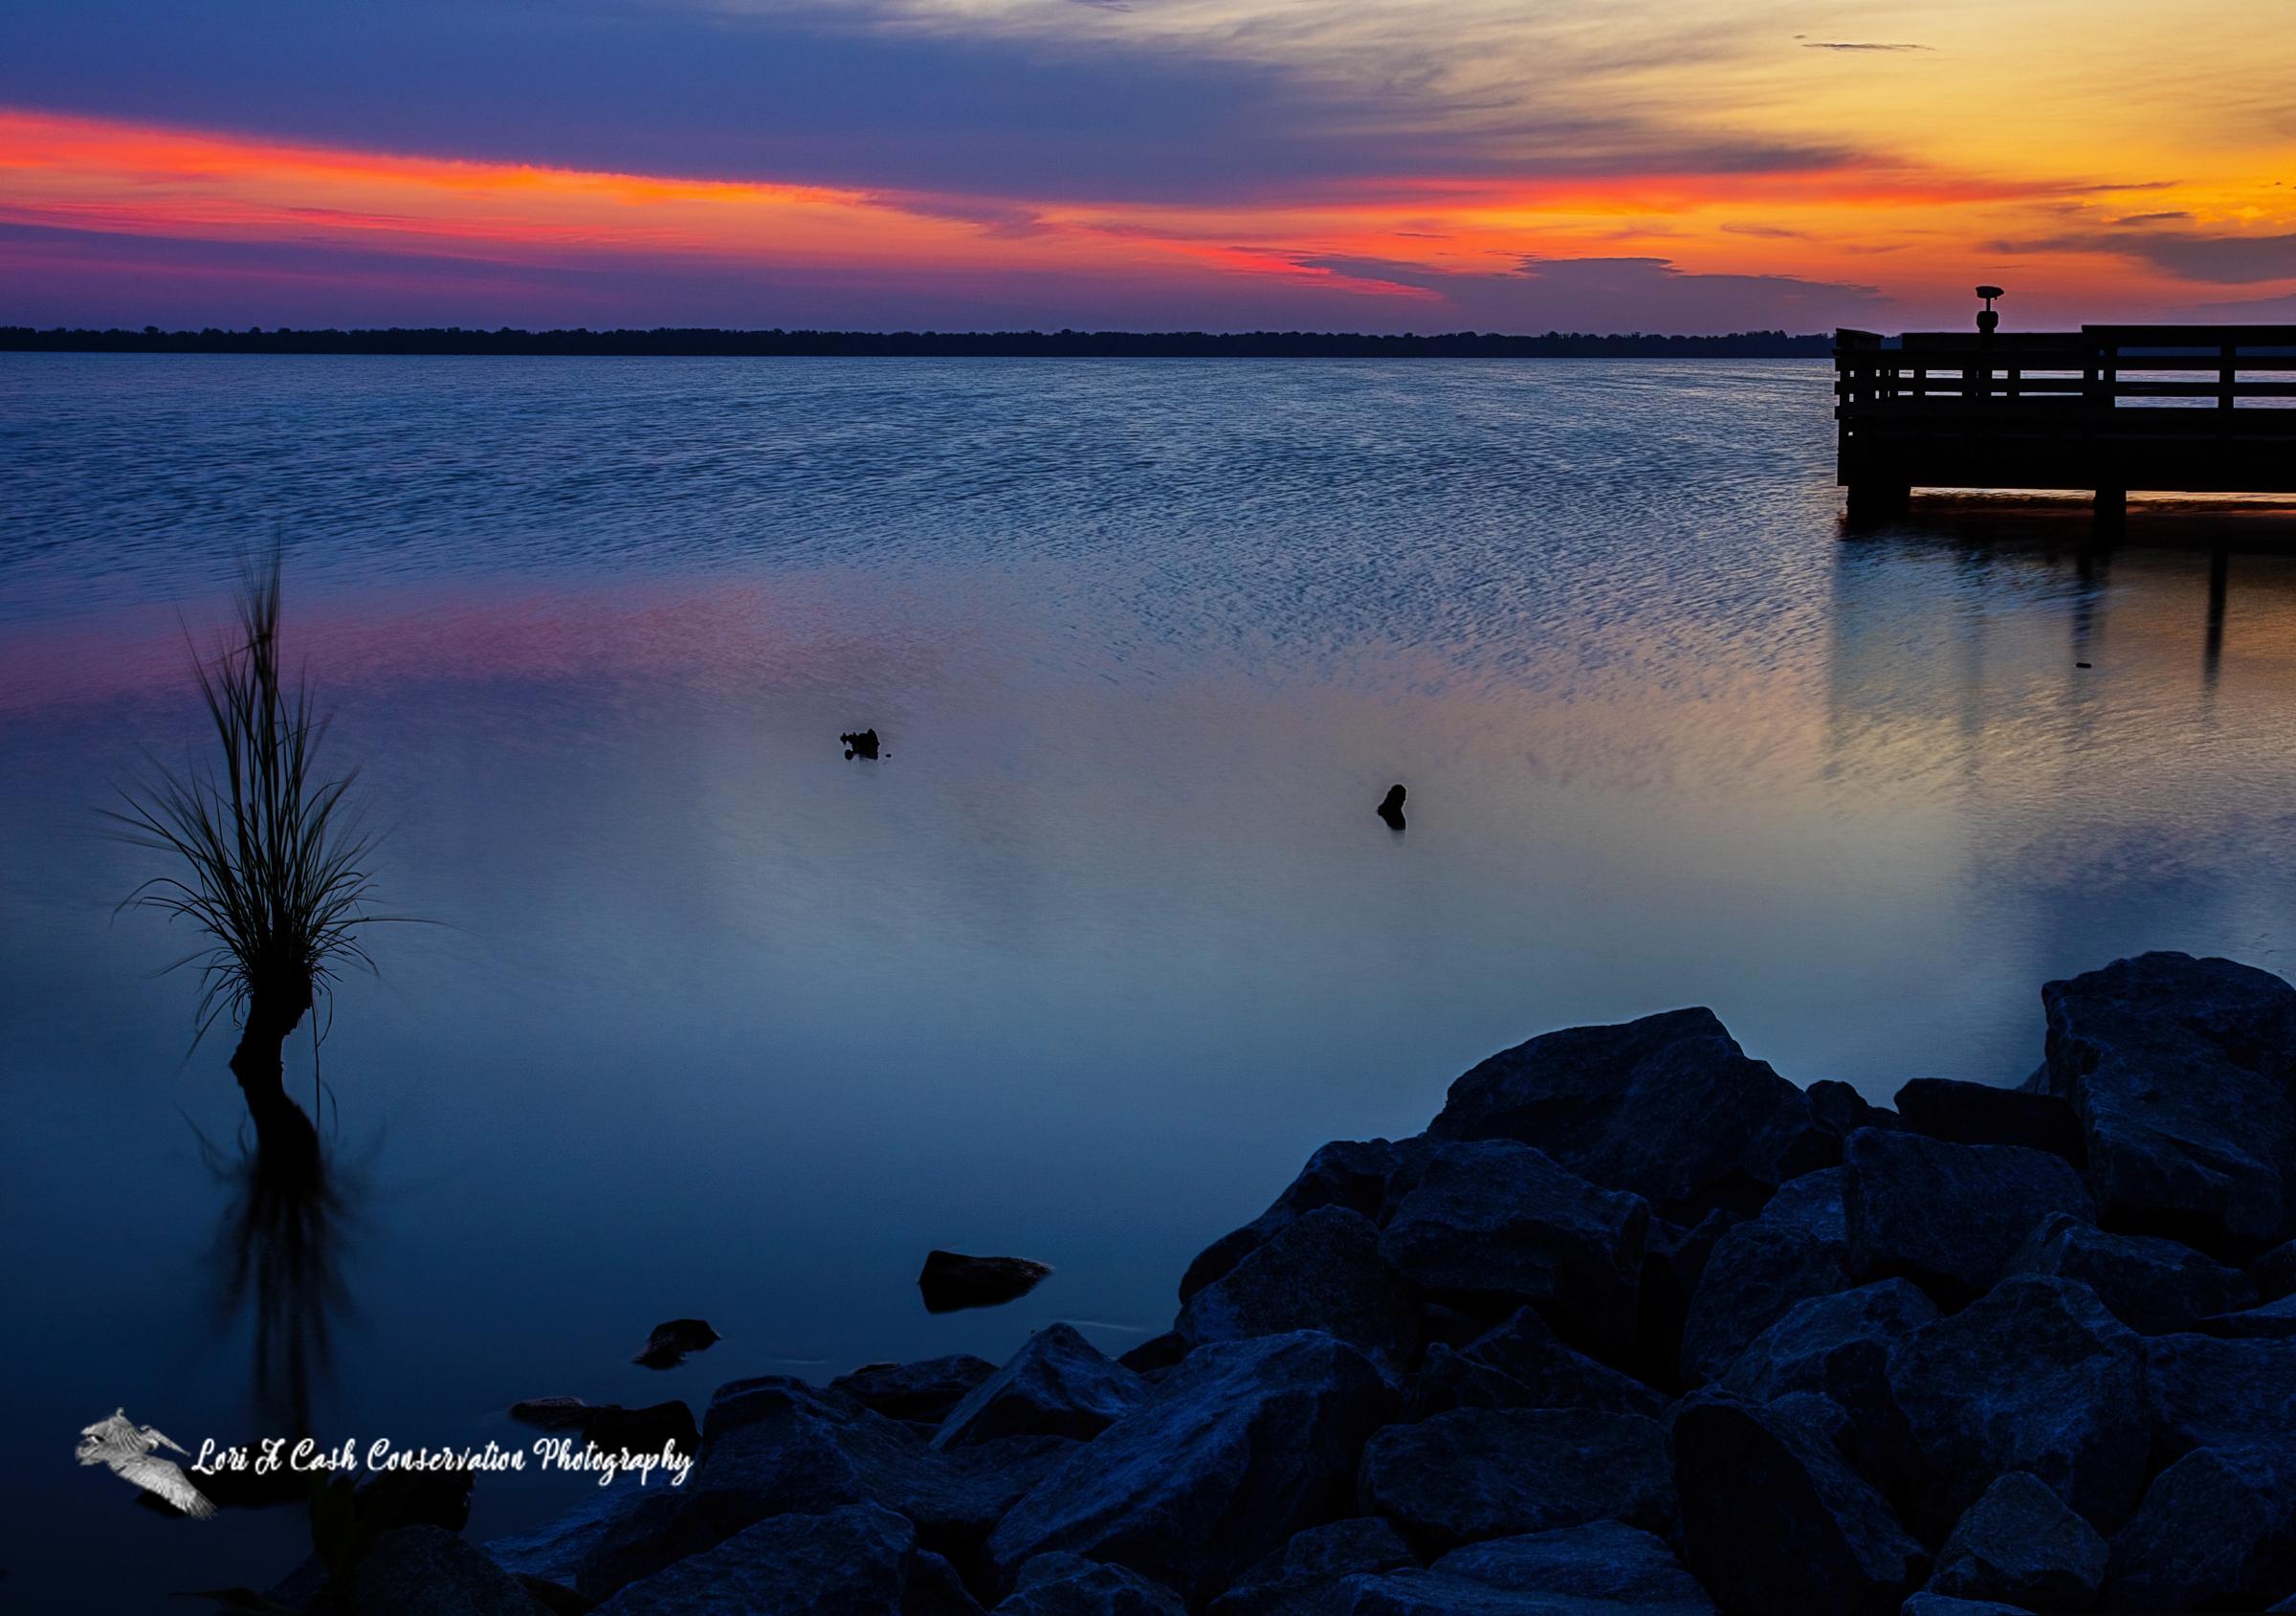 Summer Solstice Sunrise at Lake Drummond in the Great Dismal Swamp National Wildlife Refuge in Suffolk, Virginia.